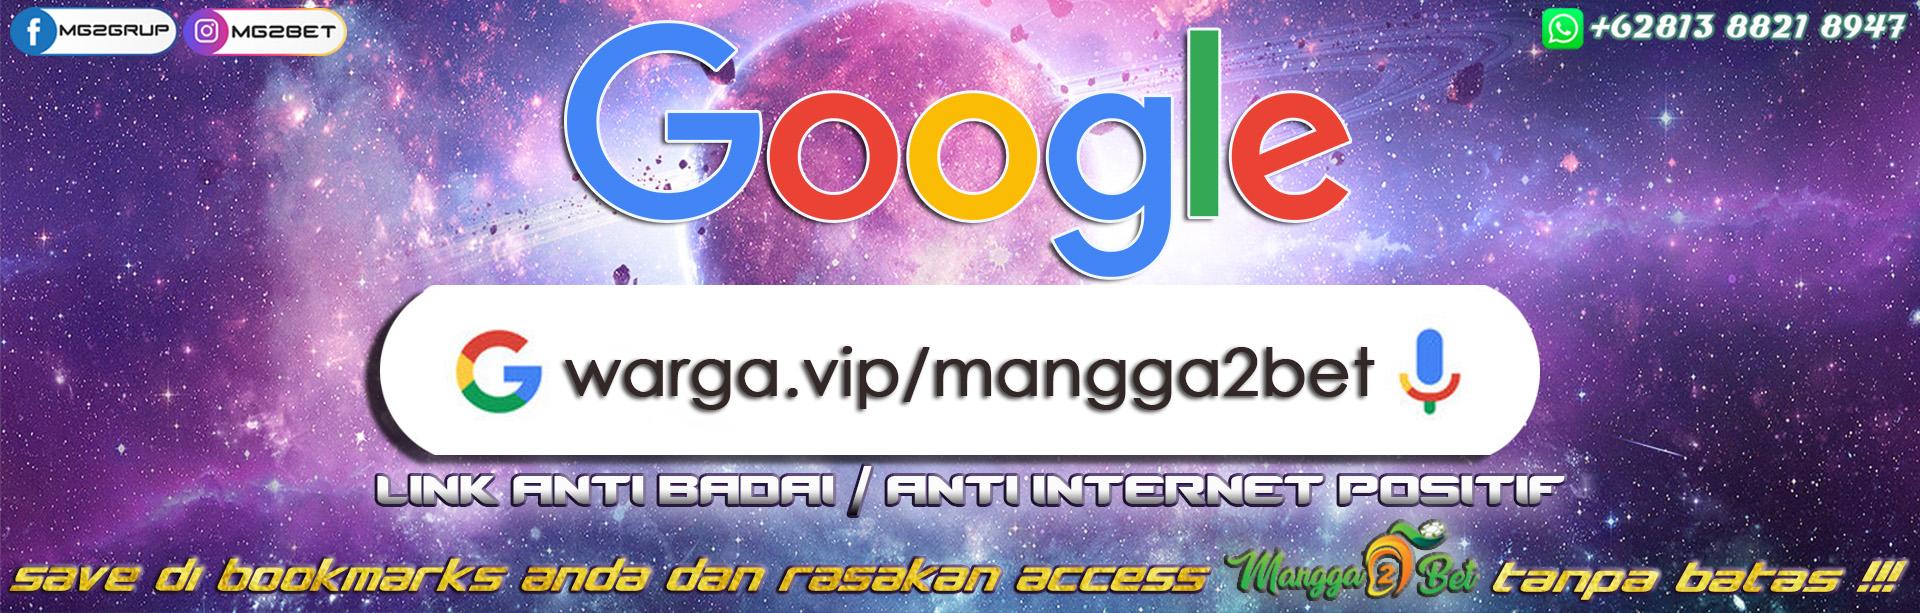 Link Alternatif MANGGA2BET